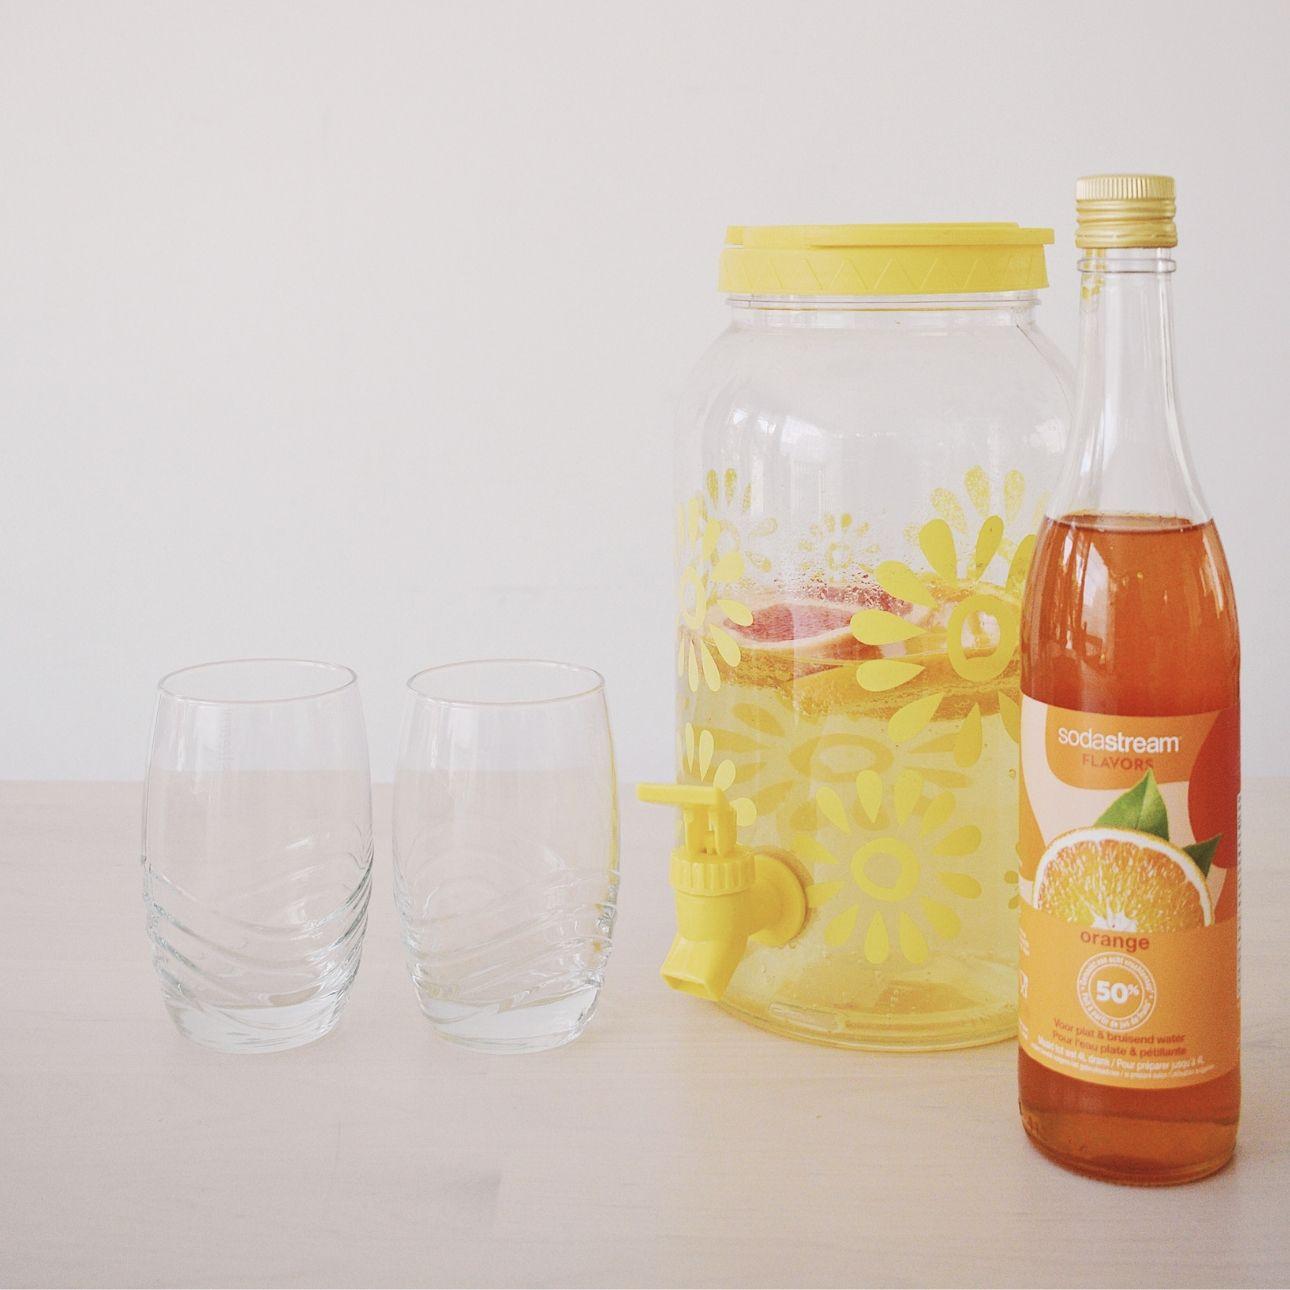 Sodastream oranje limonade sinaasappel